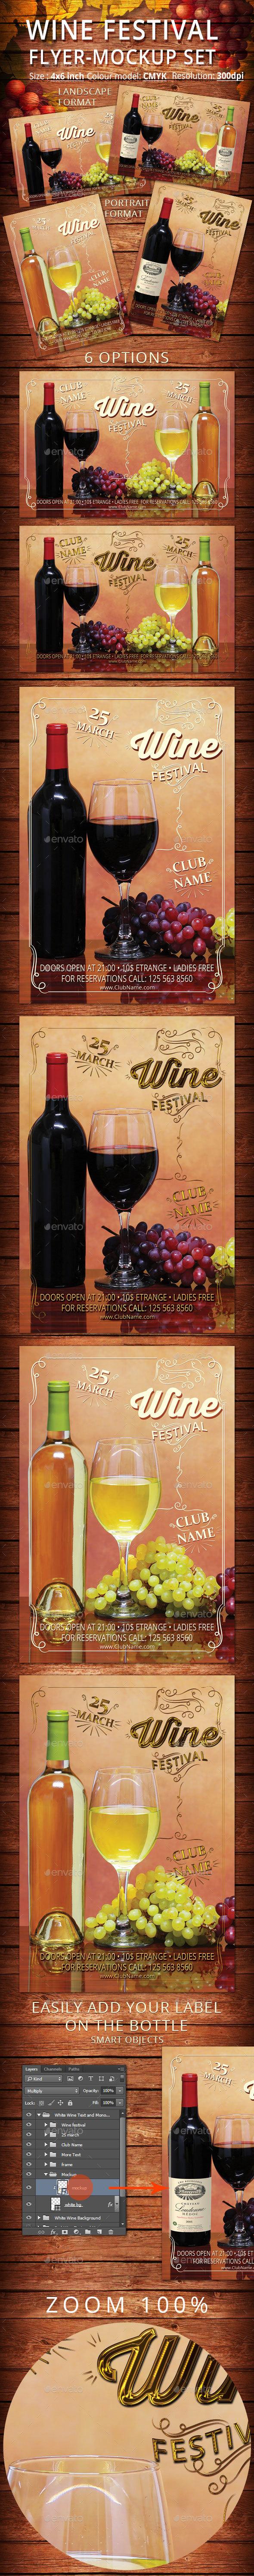 Wine Festival Flyer-Mockup Set - Events Flyers